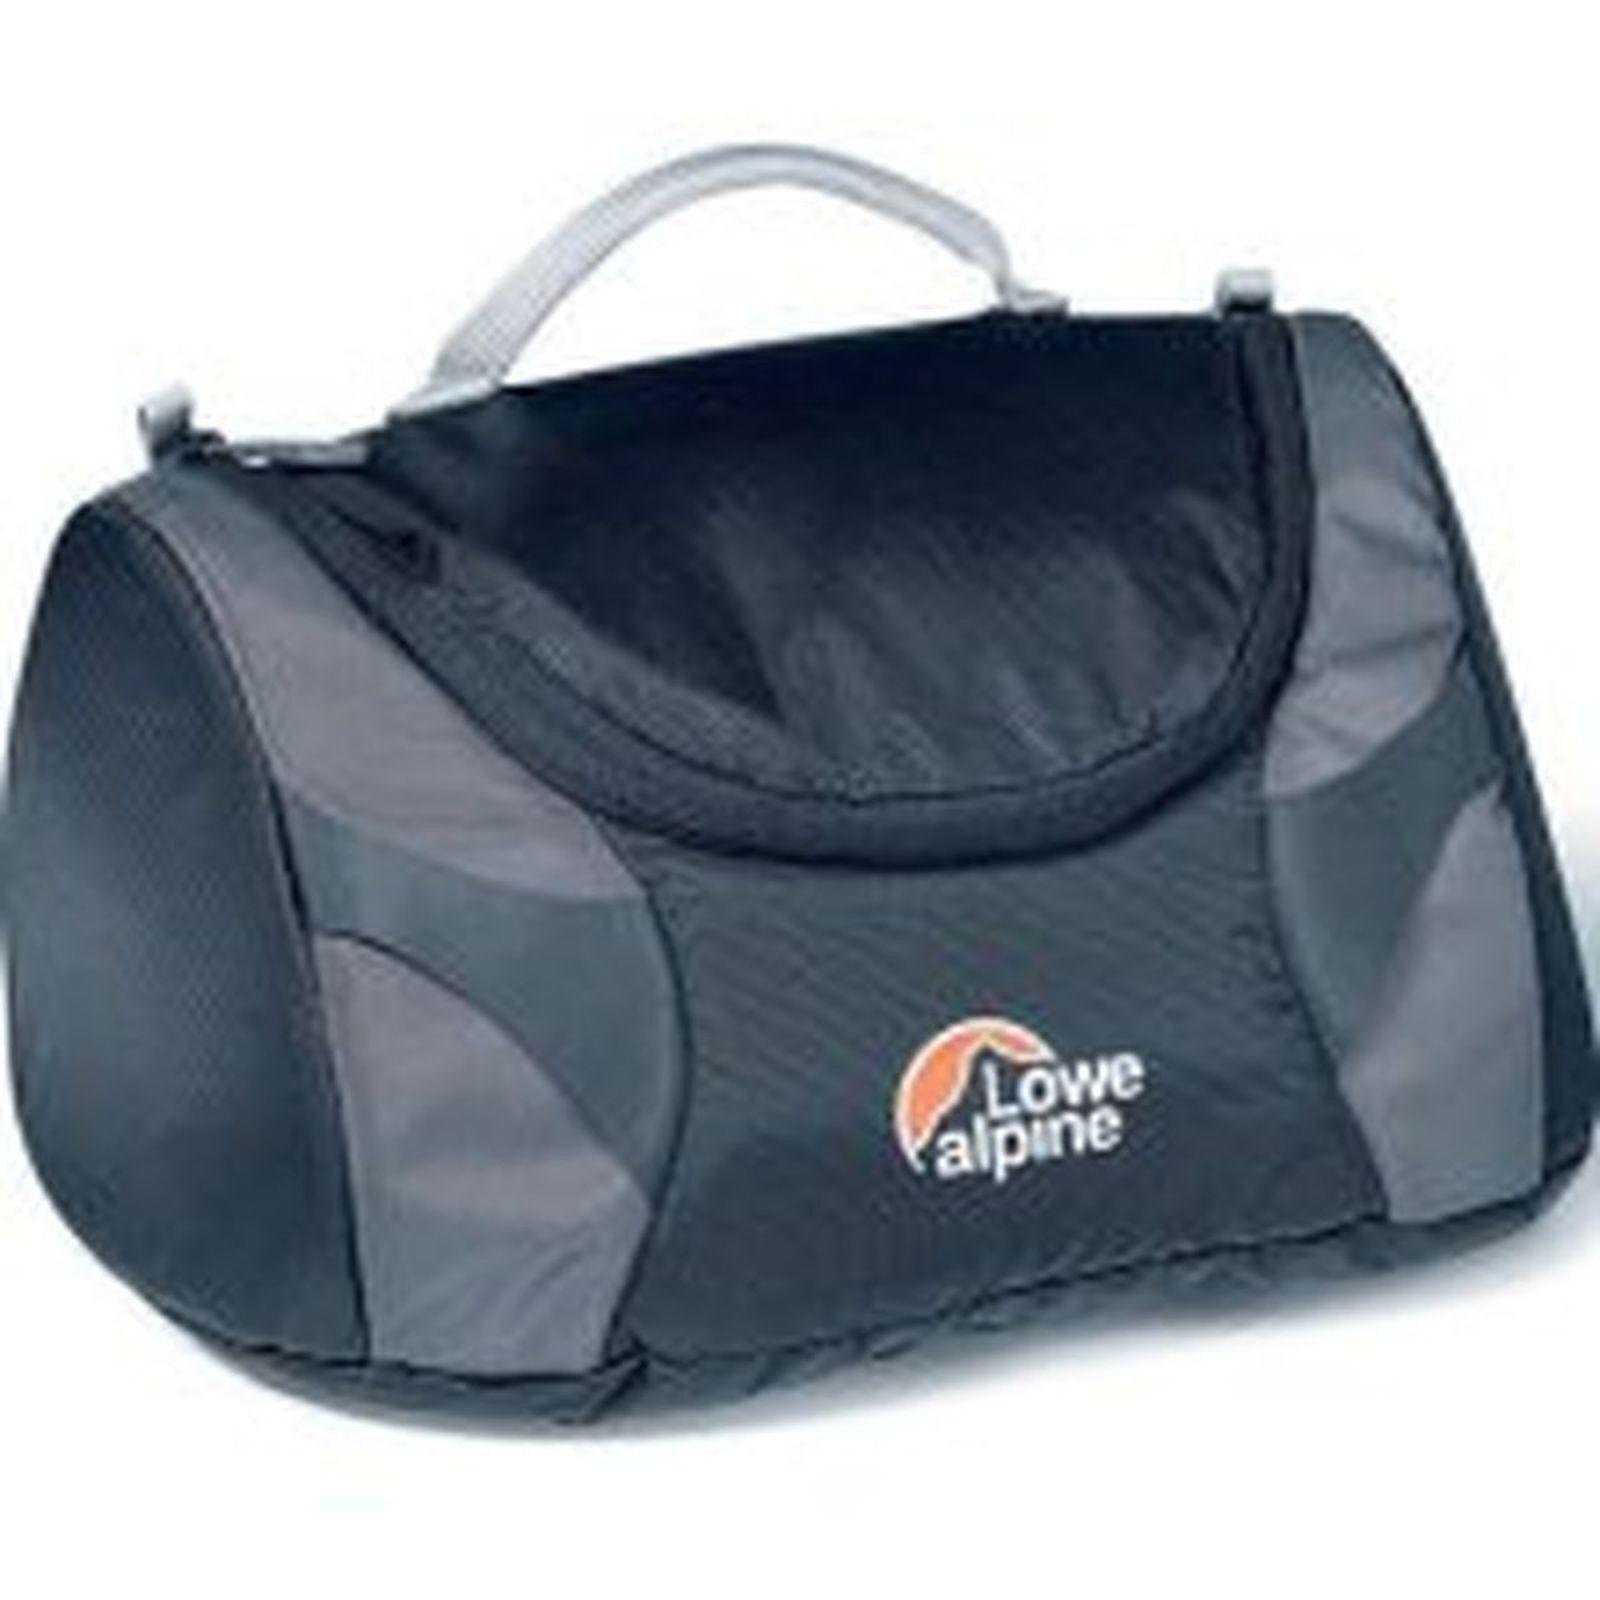 Lowe Alpine Tt Wash Bag Large